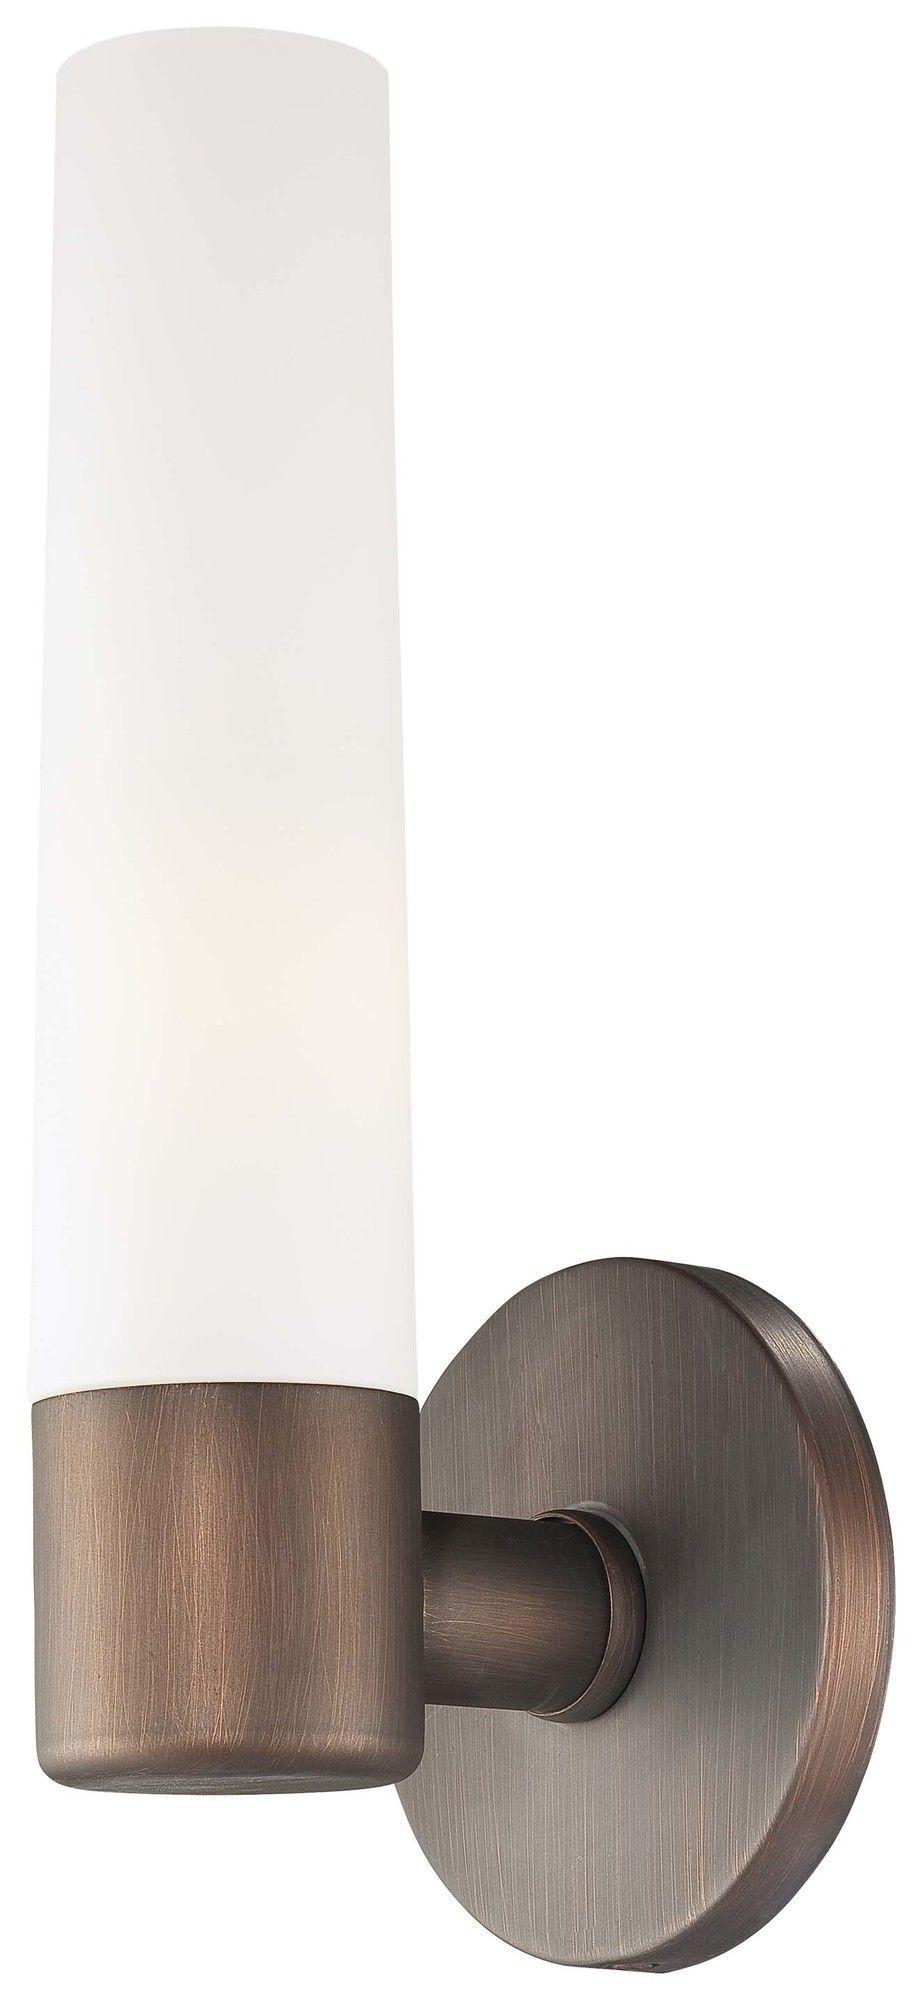 Rickford light bath sconce bath lights and products